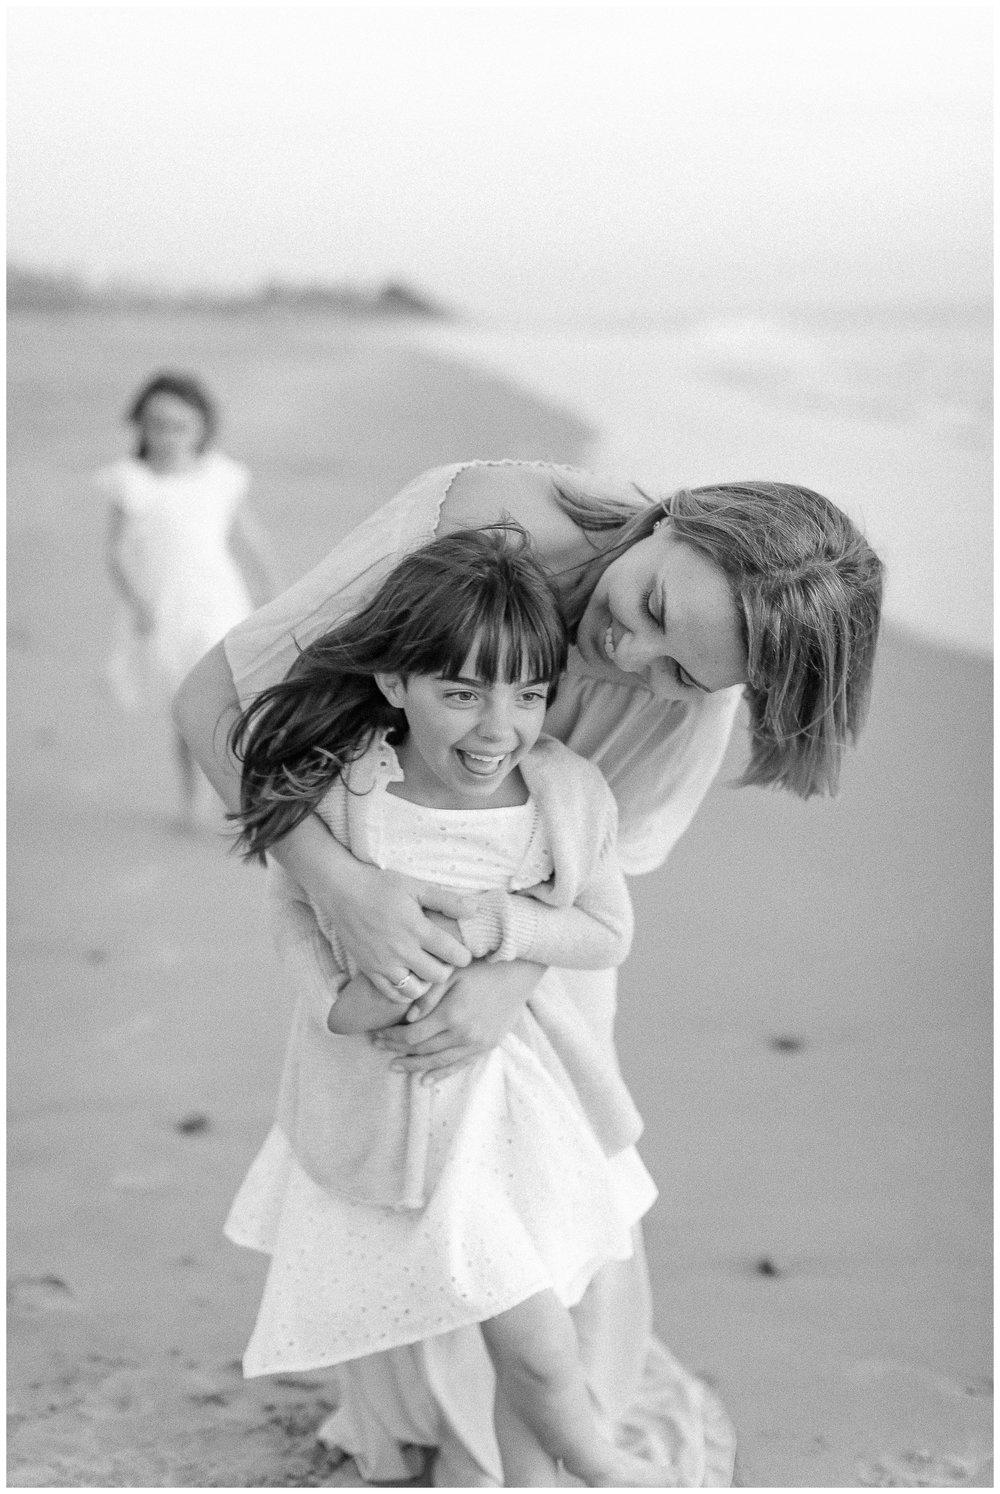 San_clemente_family_session_Orange_county_family_photographer_cori_kleckner_photography_laguna_beach_family_session_0716.jpg